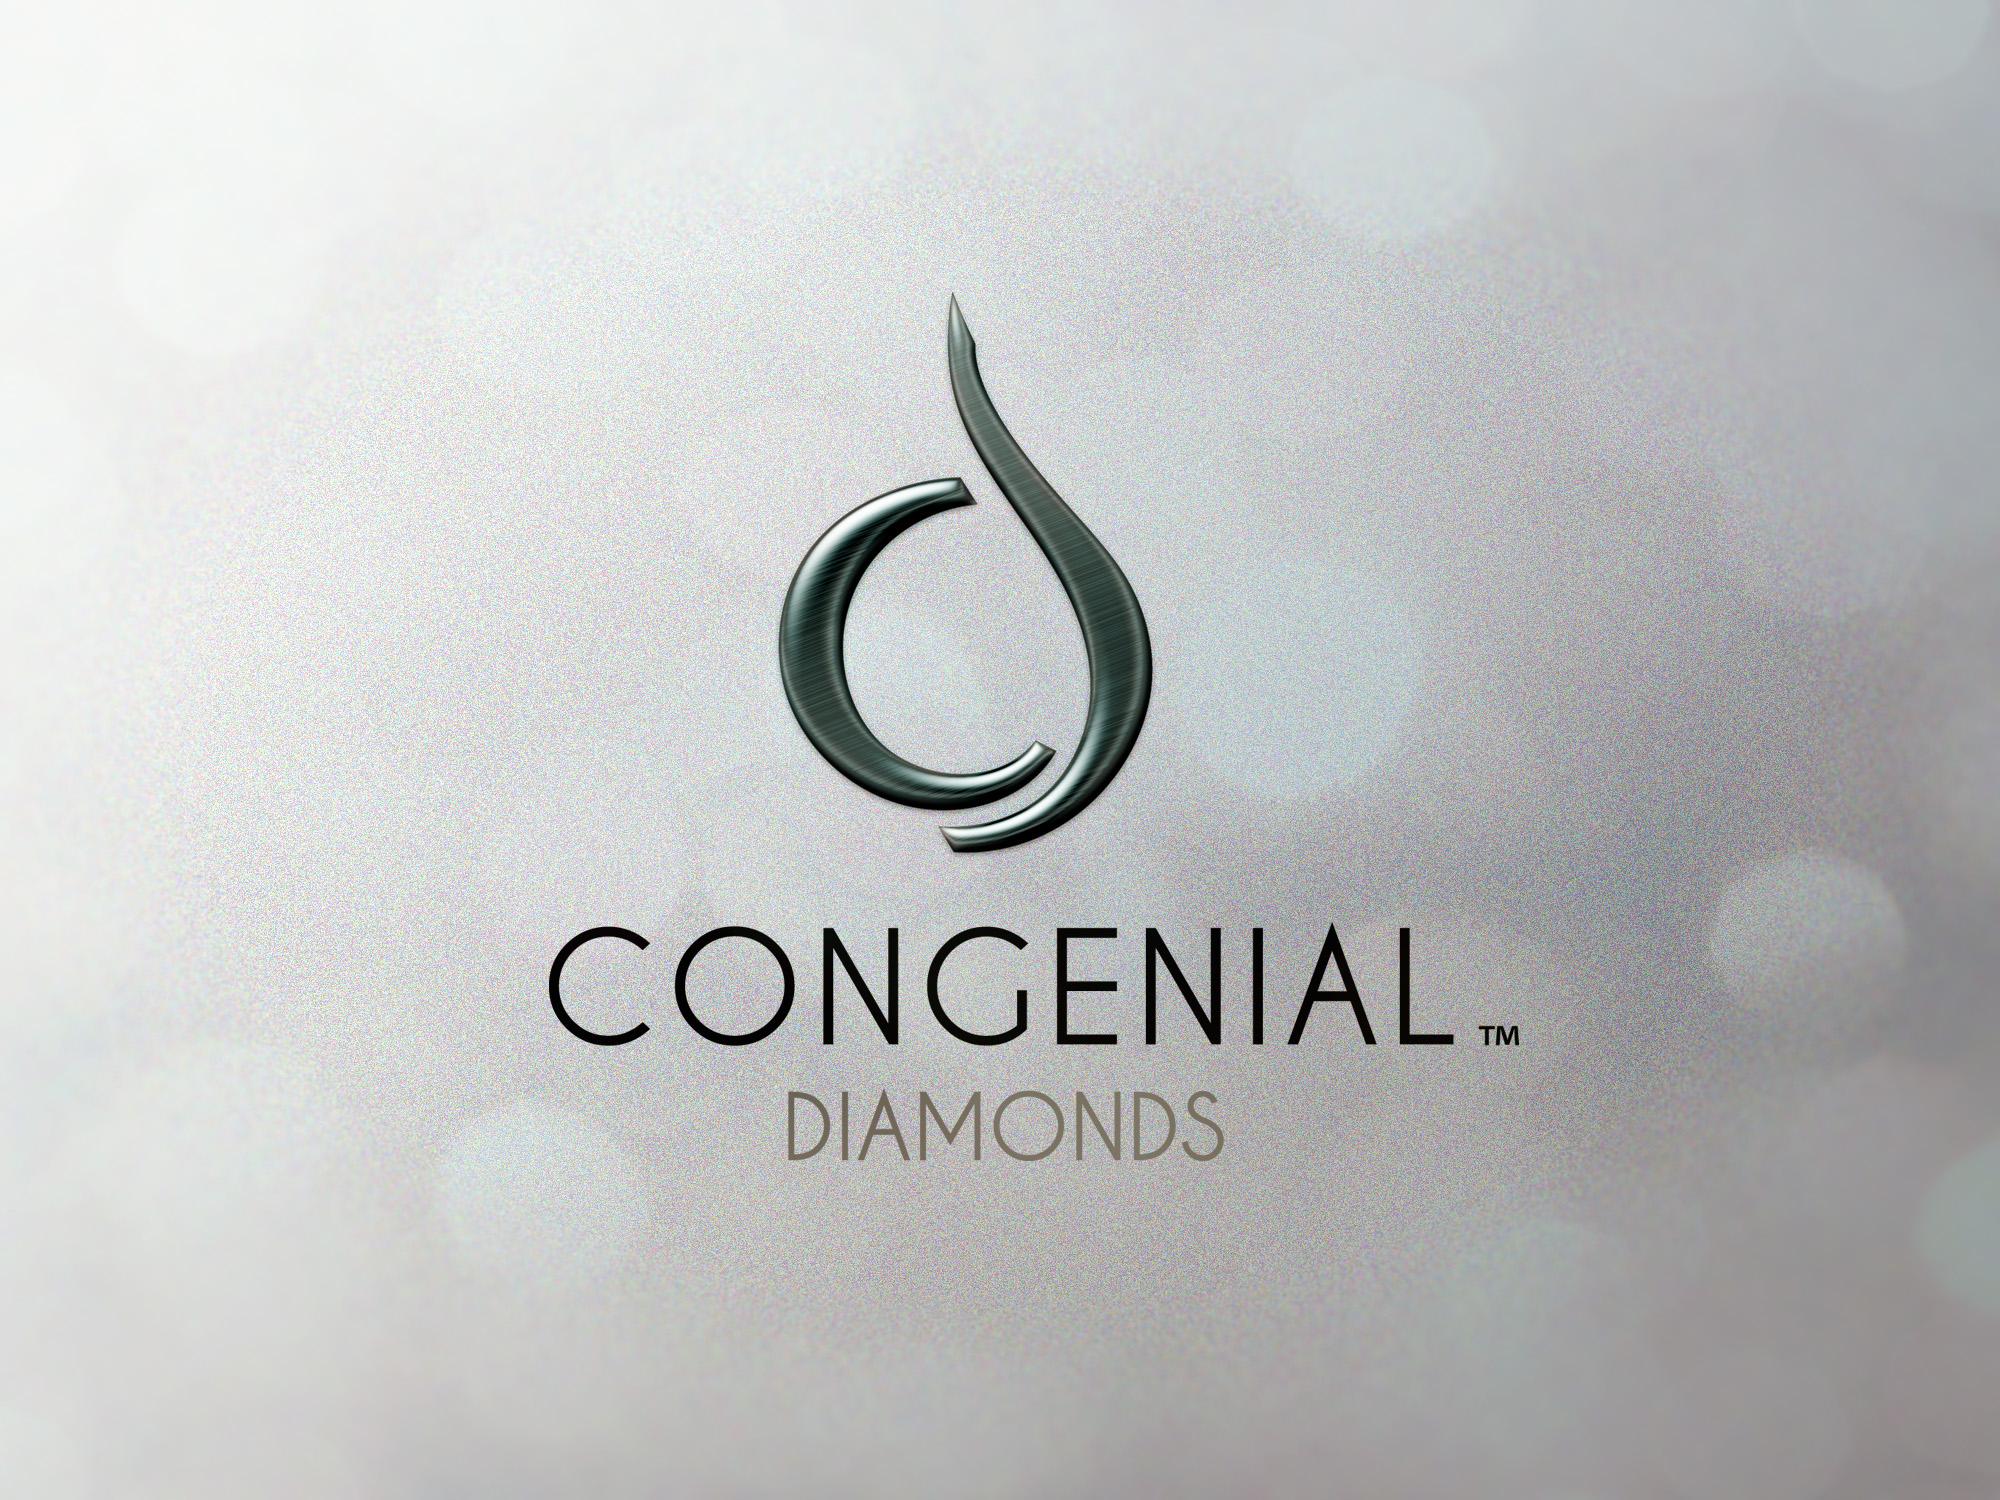 Congenial Diamonds